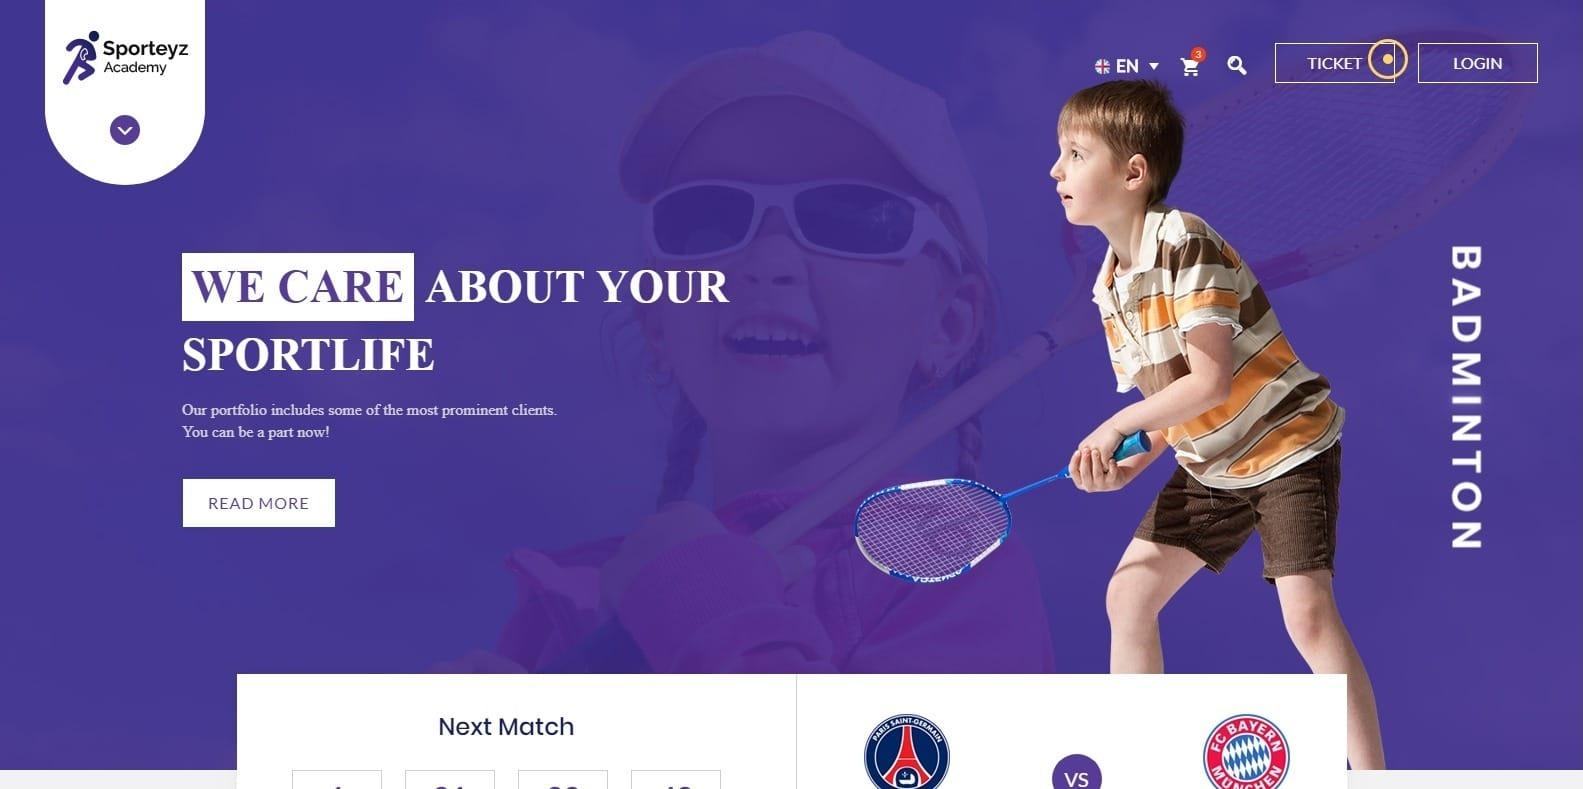 sporteyz-sports-website-template